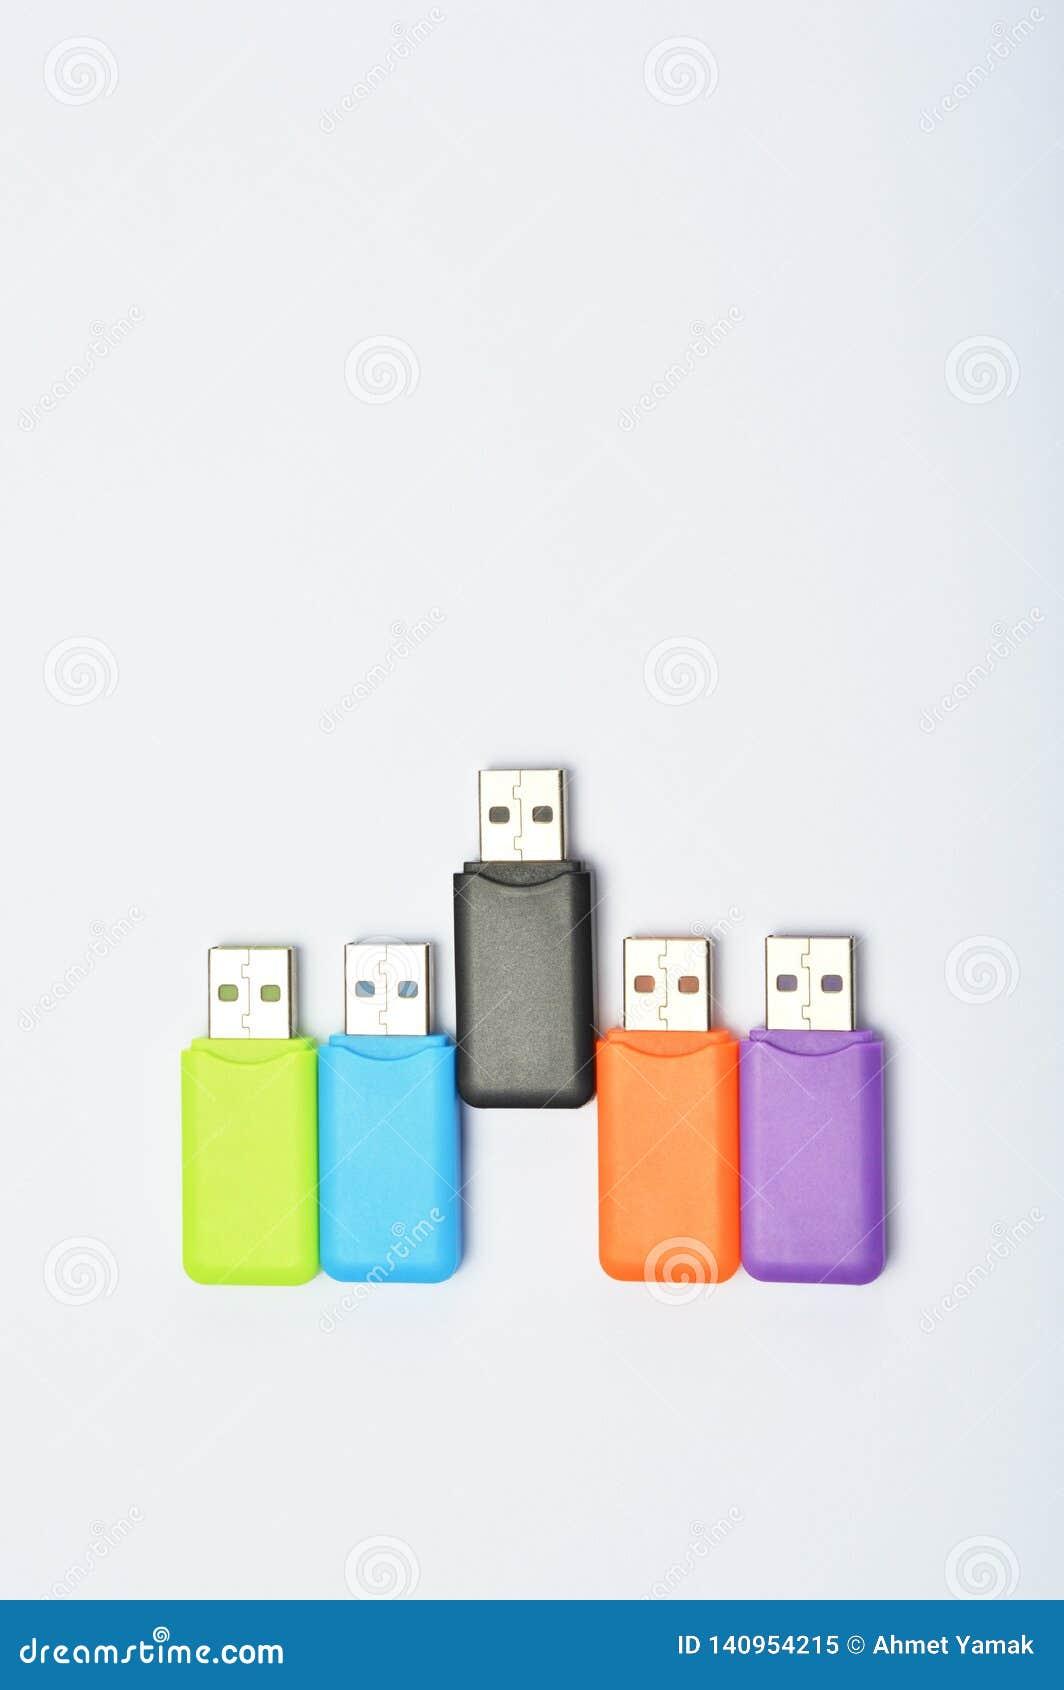 Multi colored USB sticks